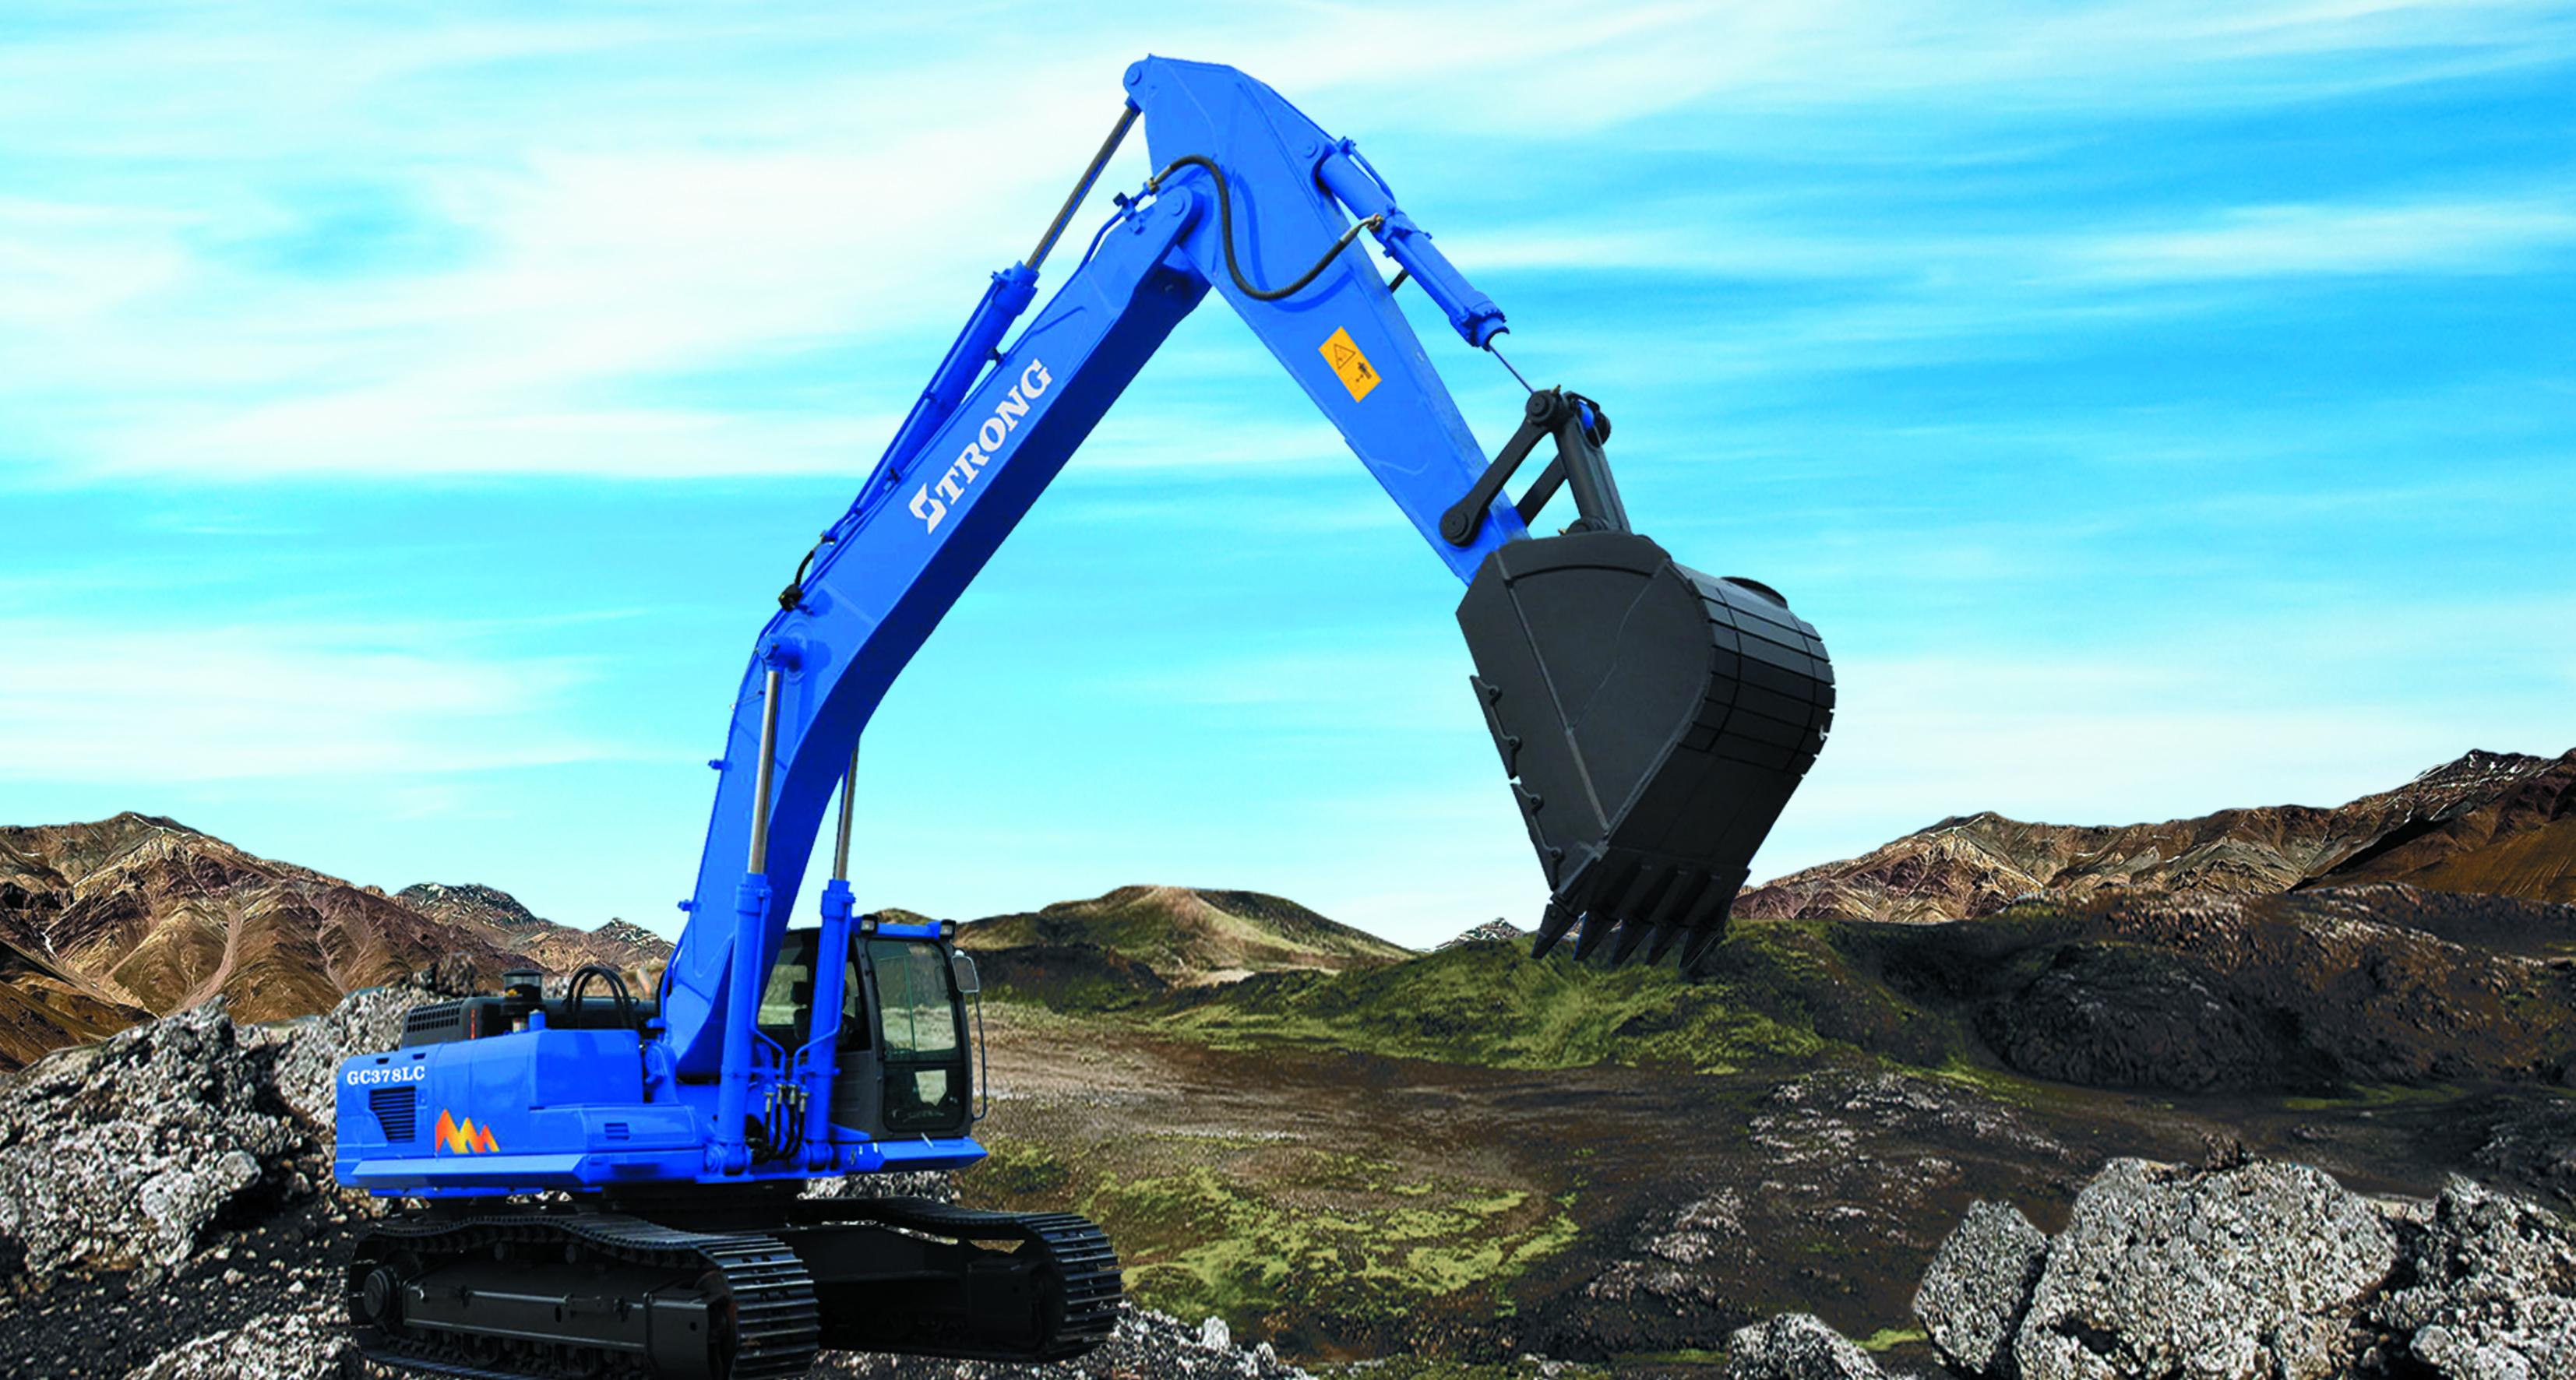 GC378LC-8 Hydraulic Crawler Excavator